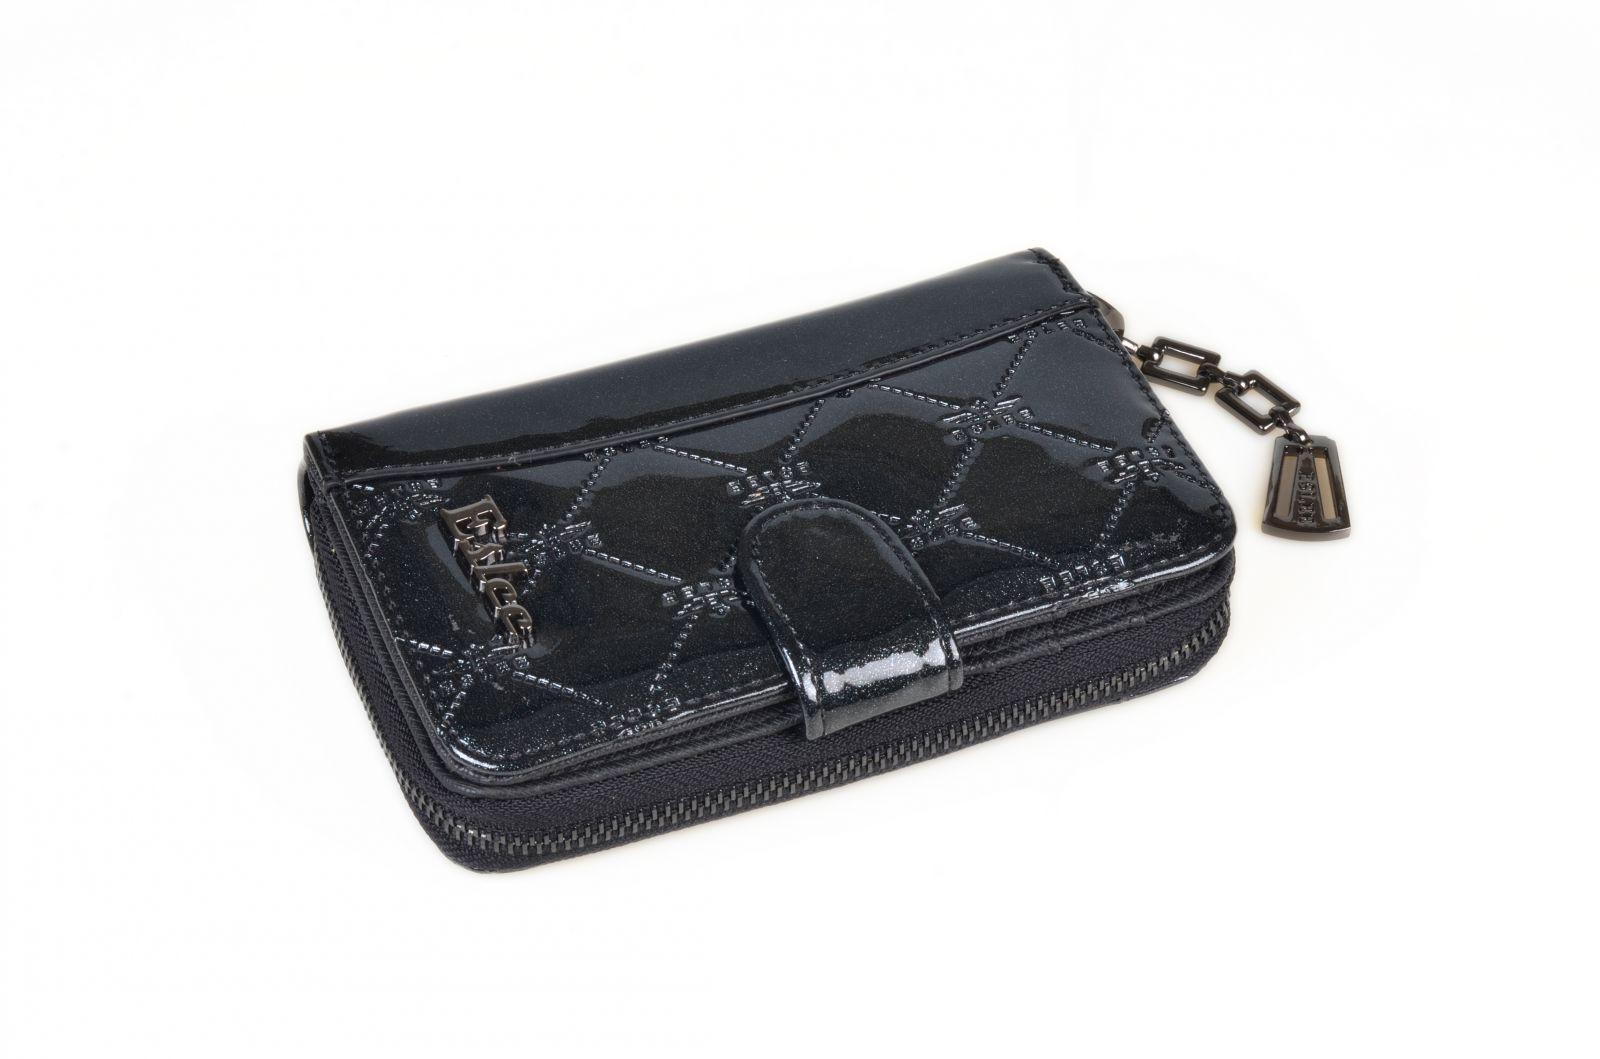 Dámská peněženka malá ESLEE 6233 black